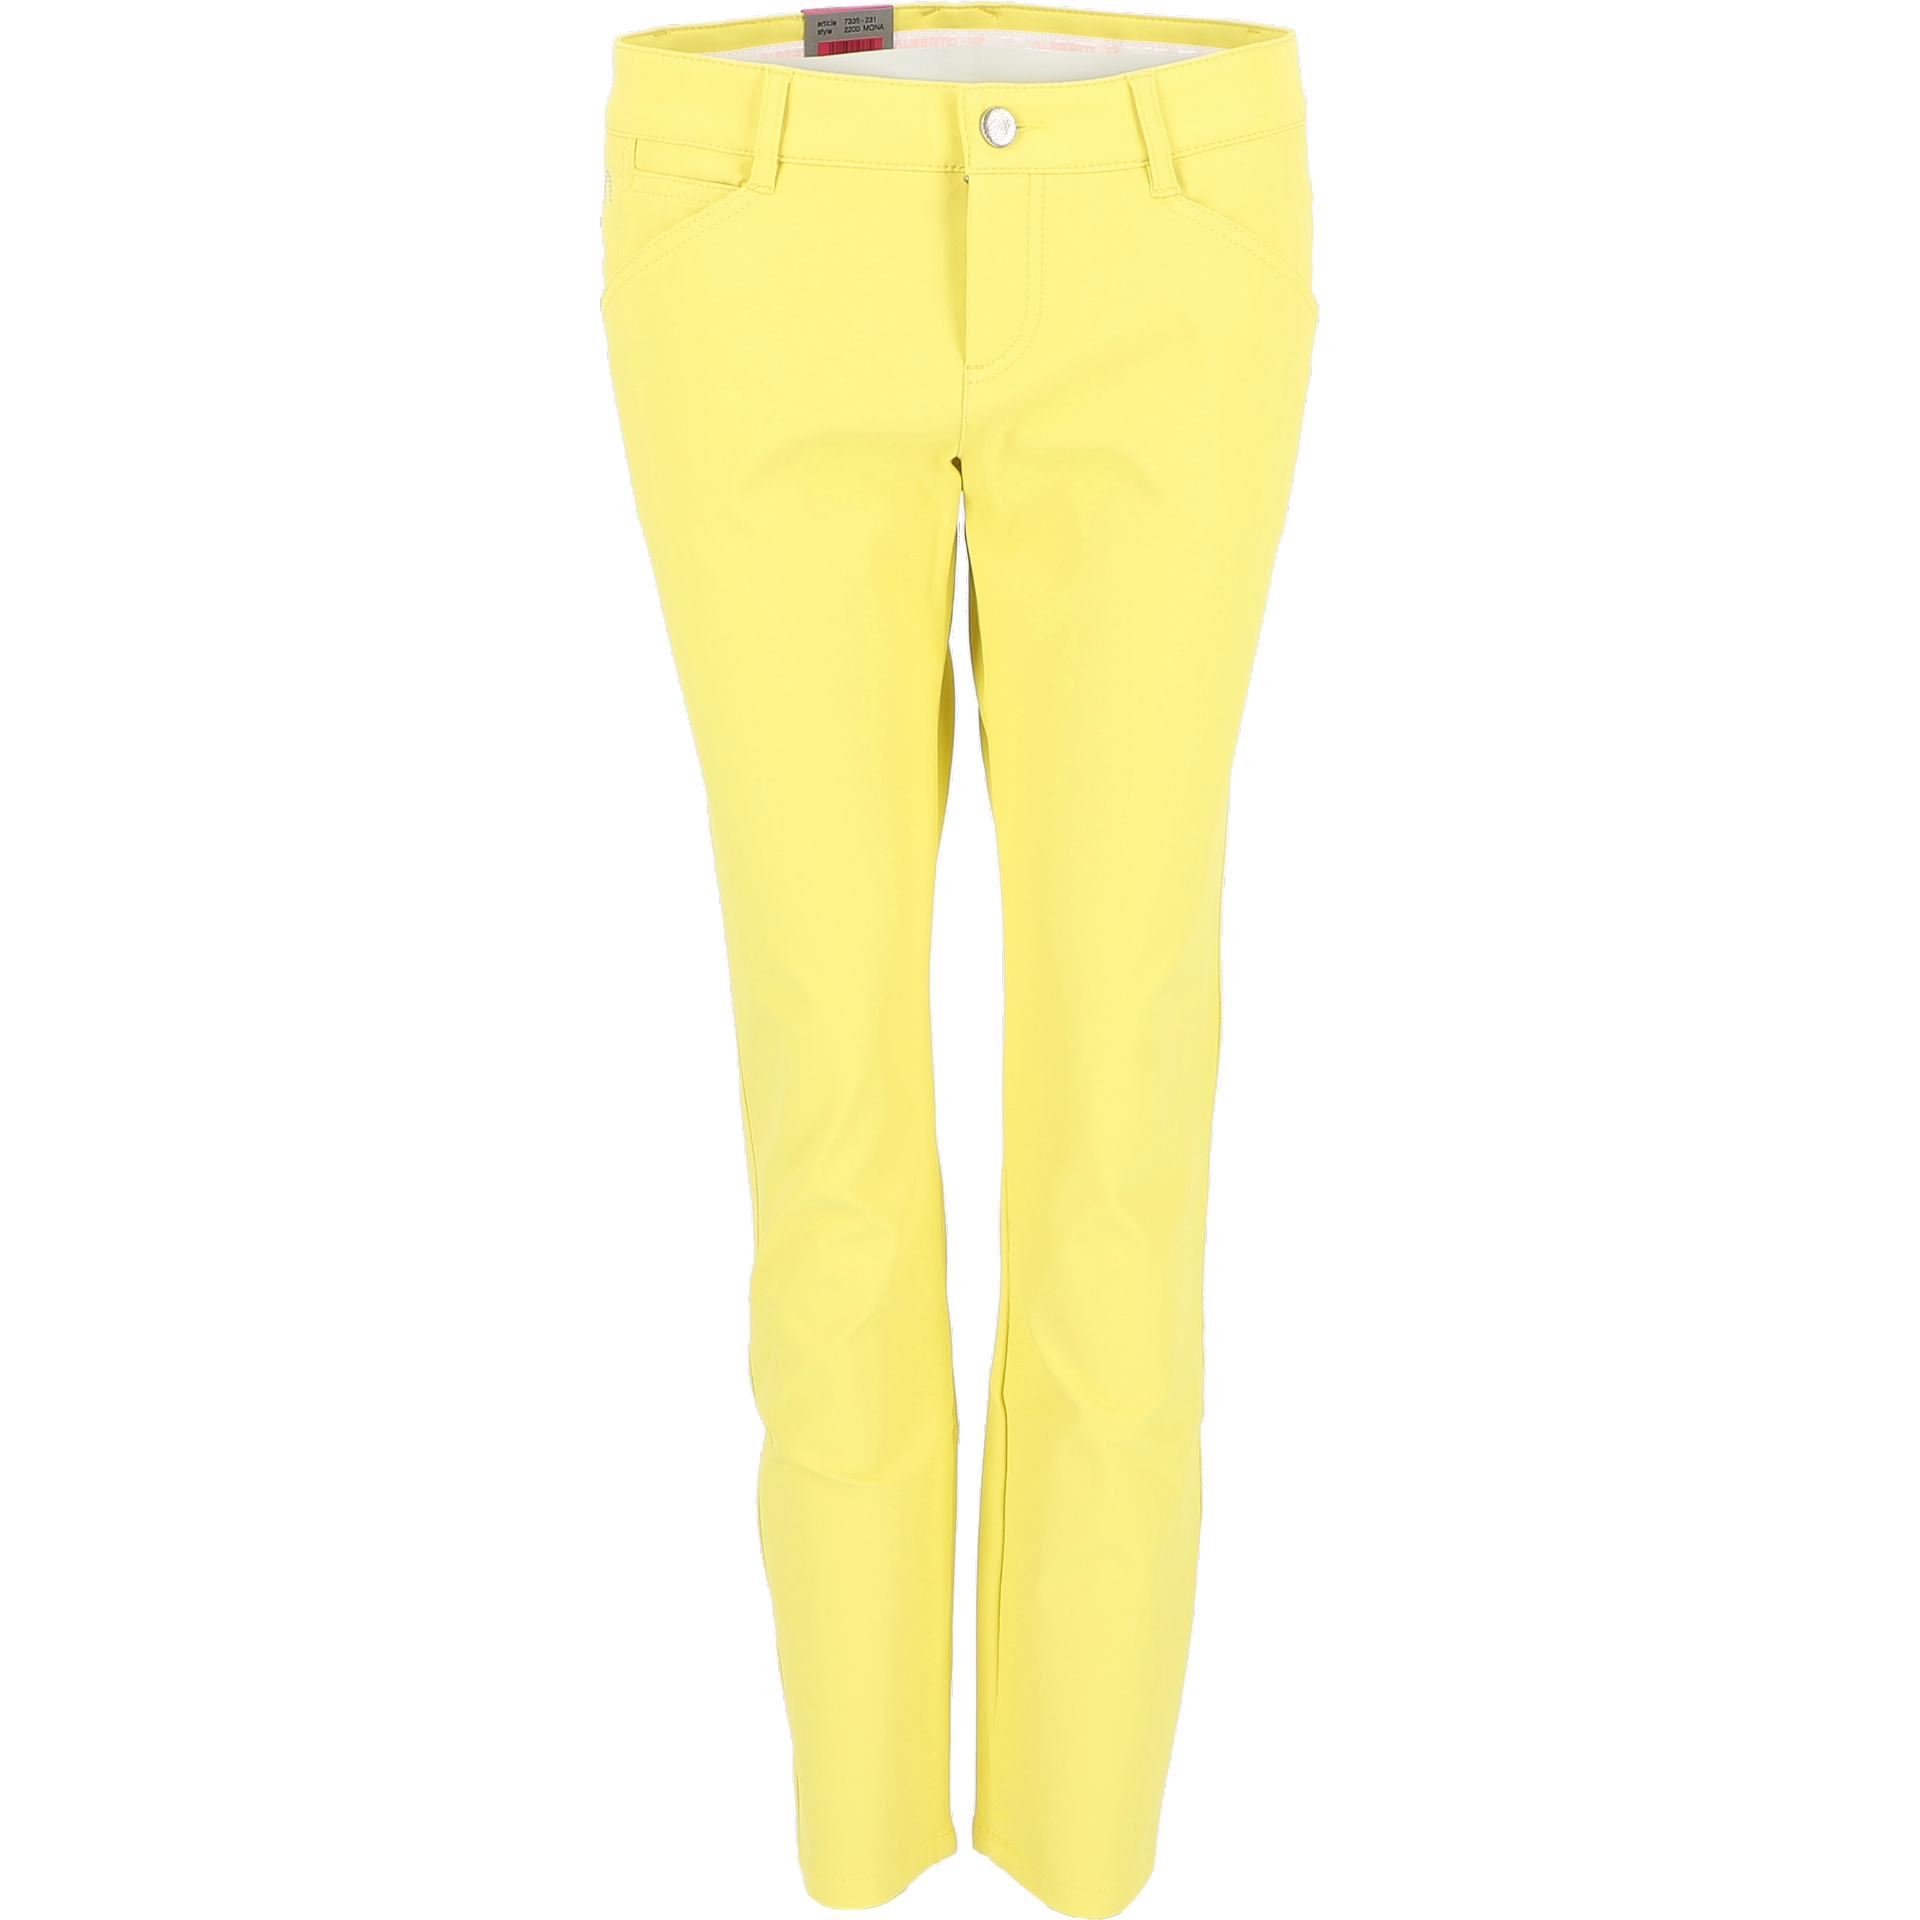 MONA Hose - 3xDRY Cooler, gelb